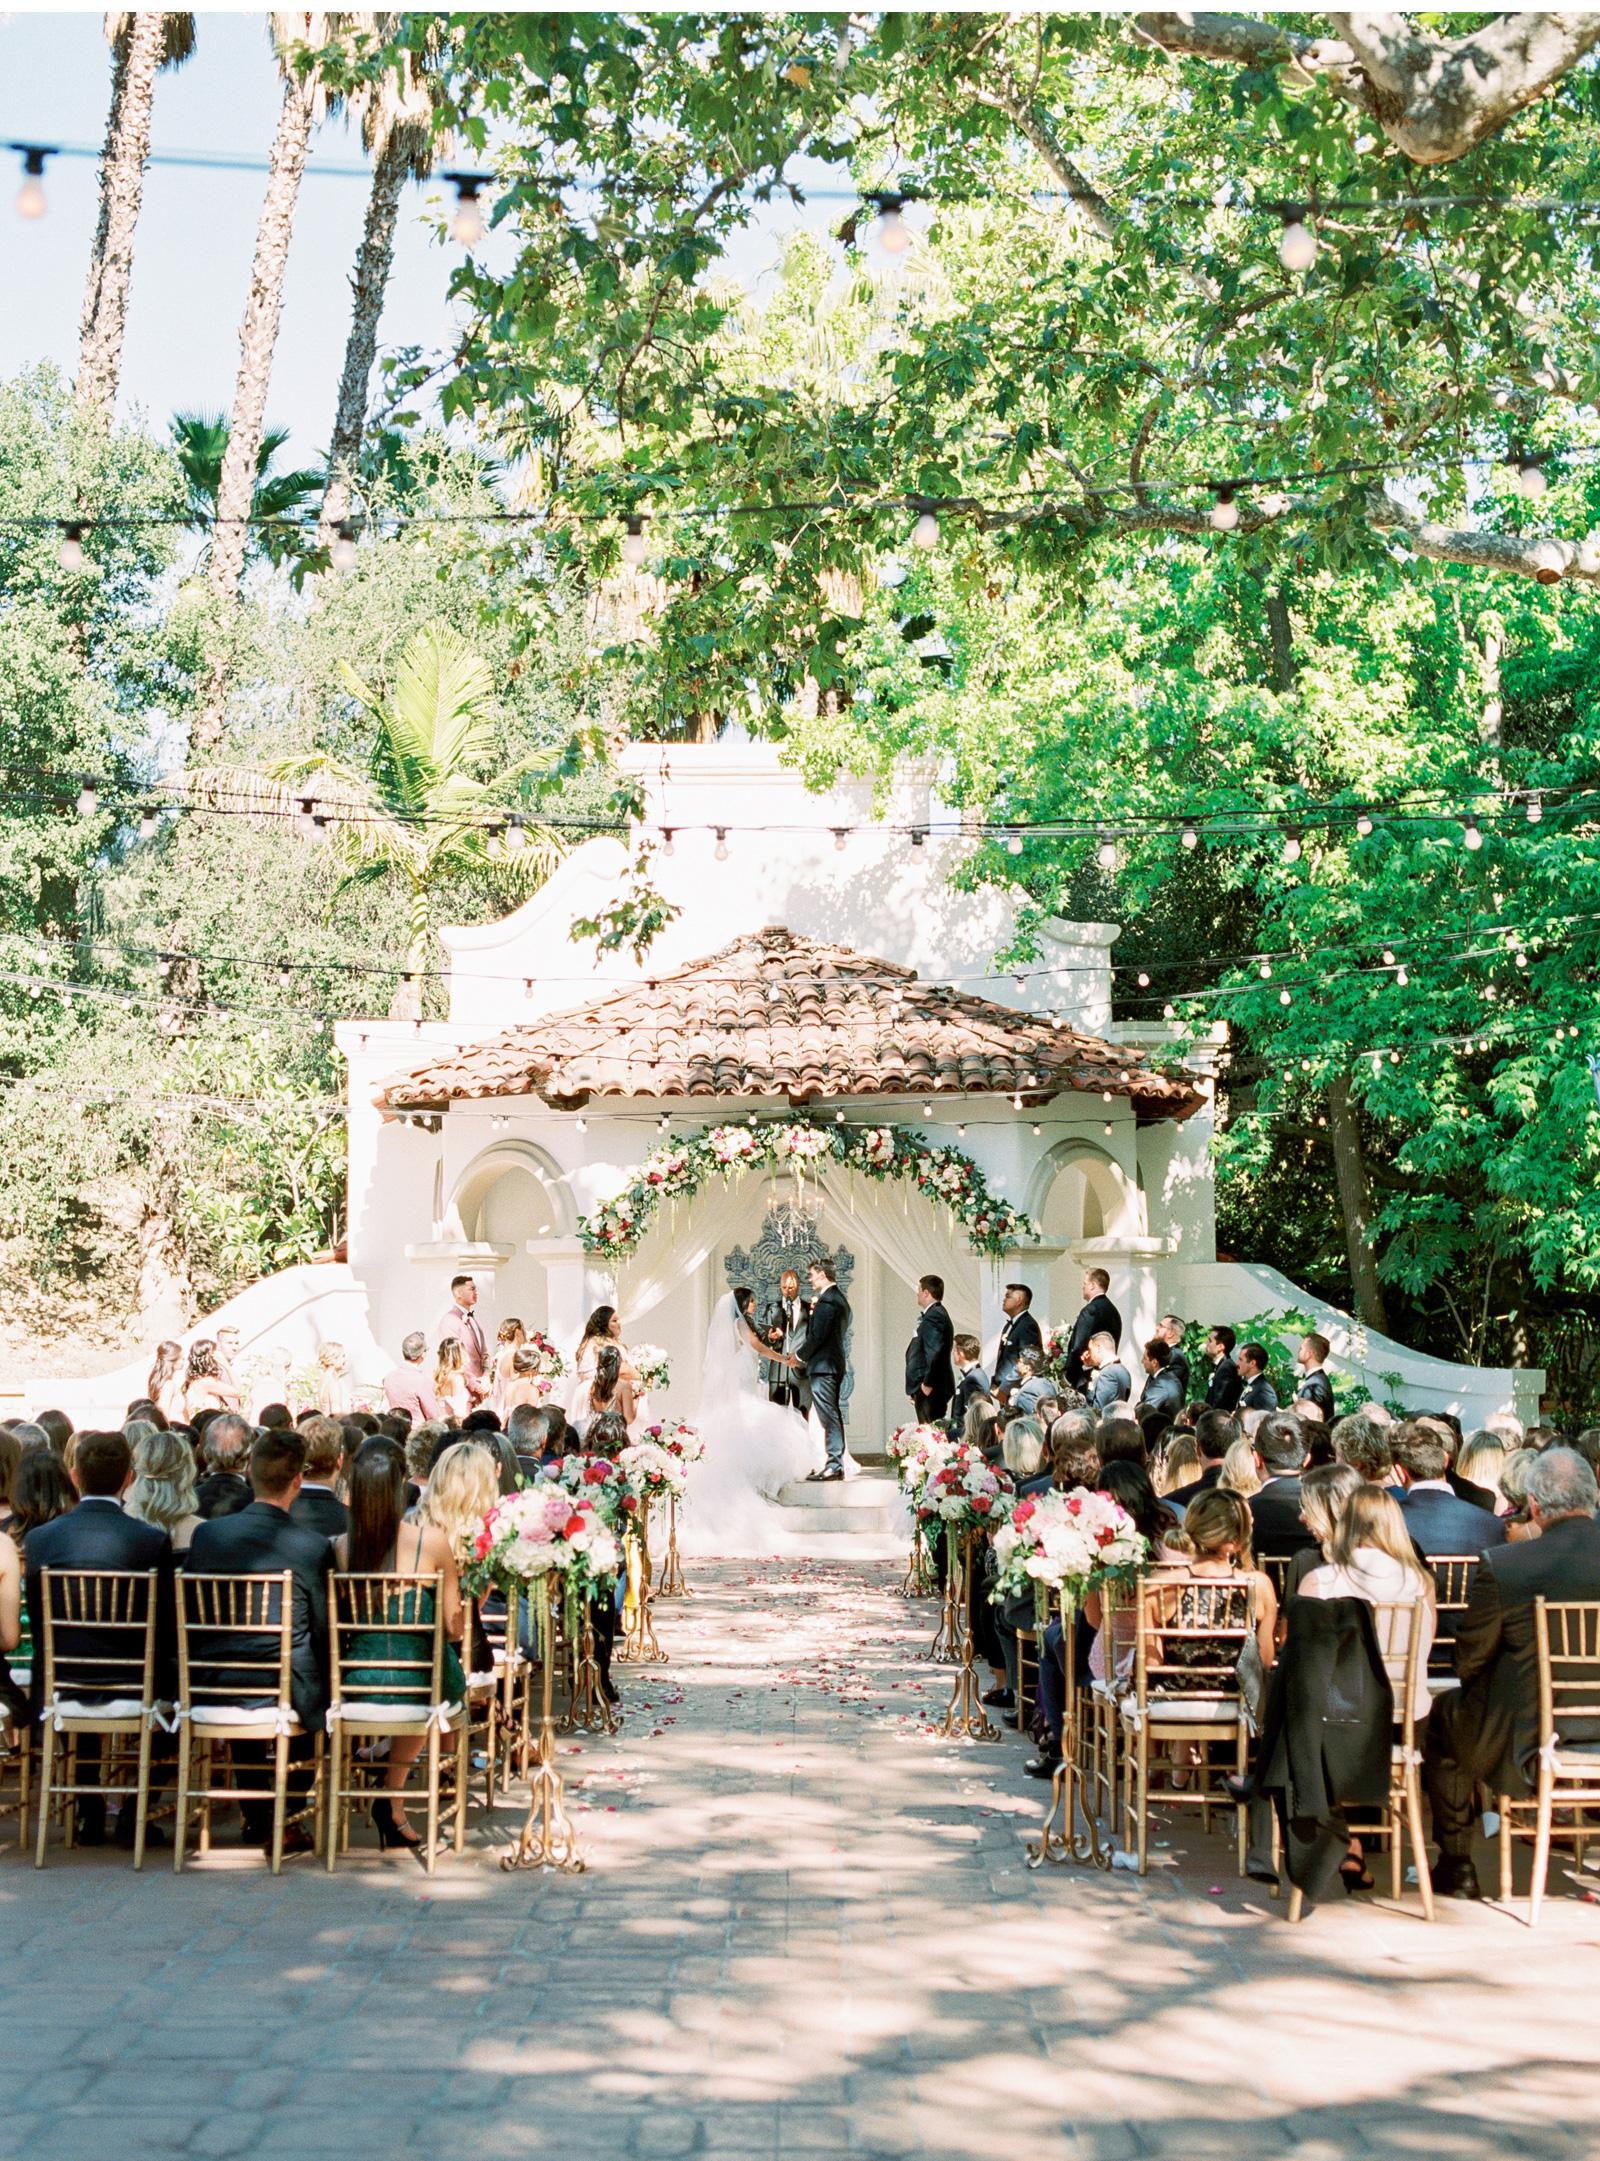 Kestrel-Park-Wedding-Natalie-Schutt-Photography_15.jpg